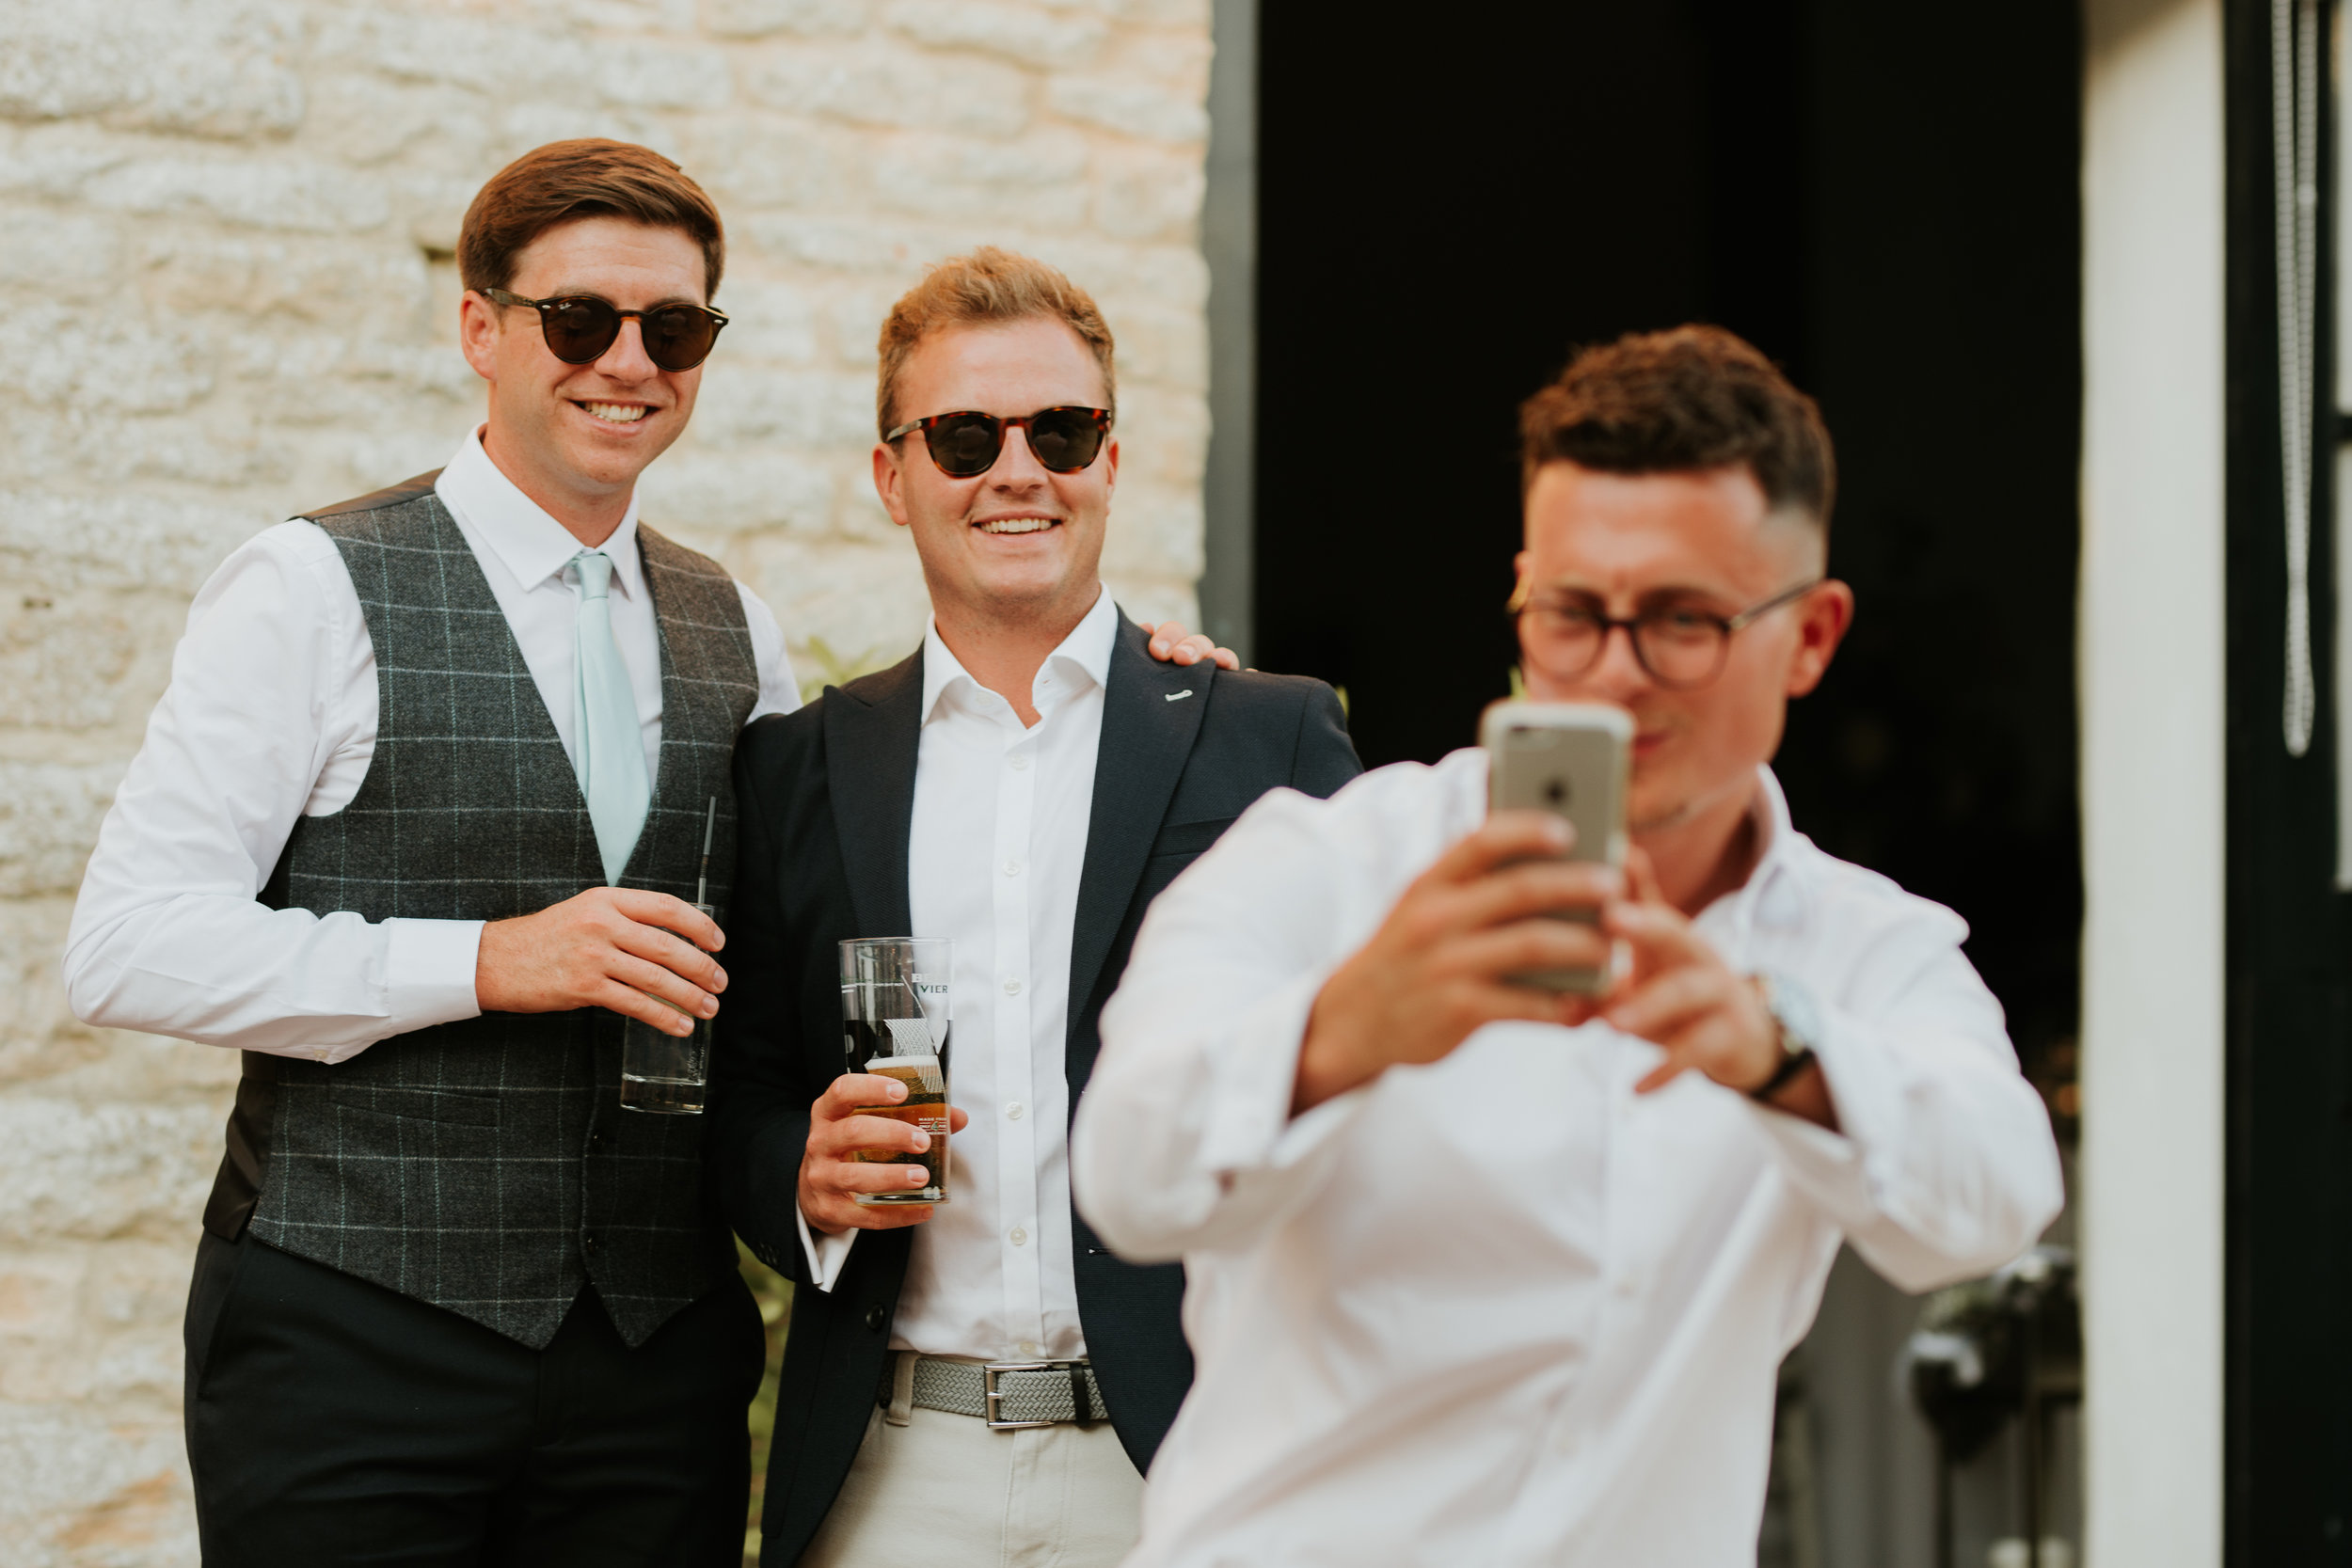 Oxfordshire-wedding-photographer-86.jpg